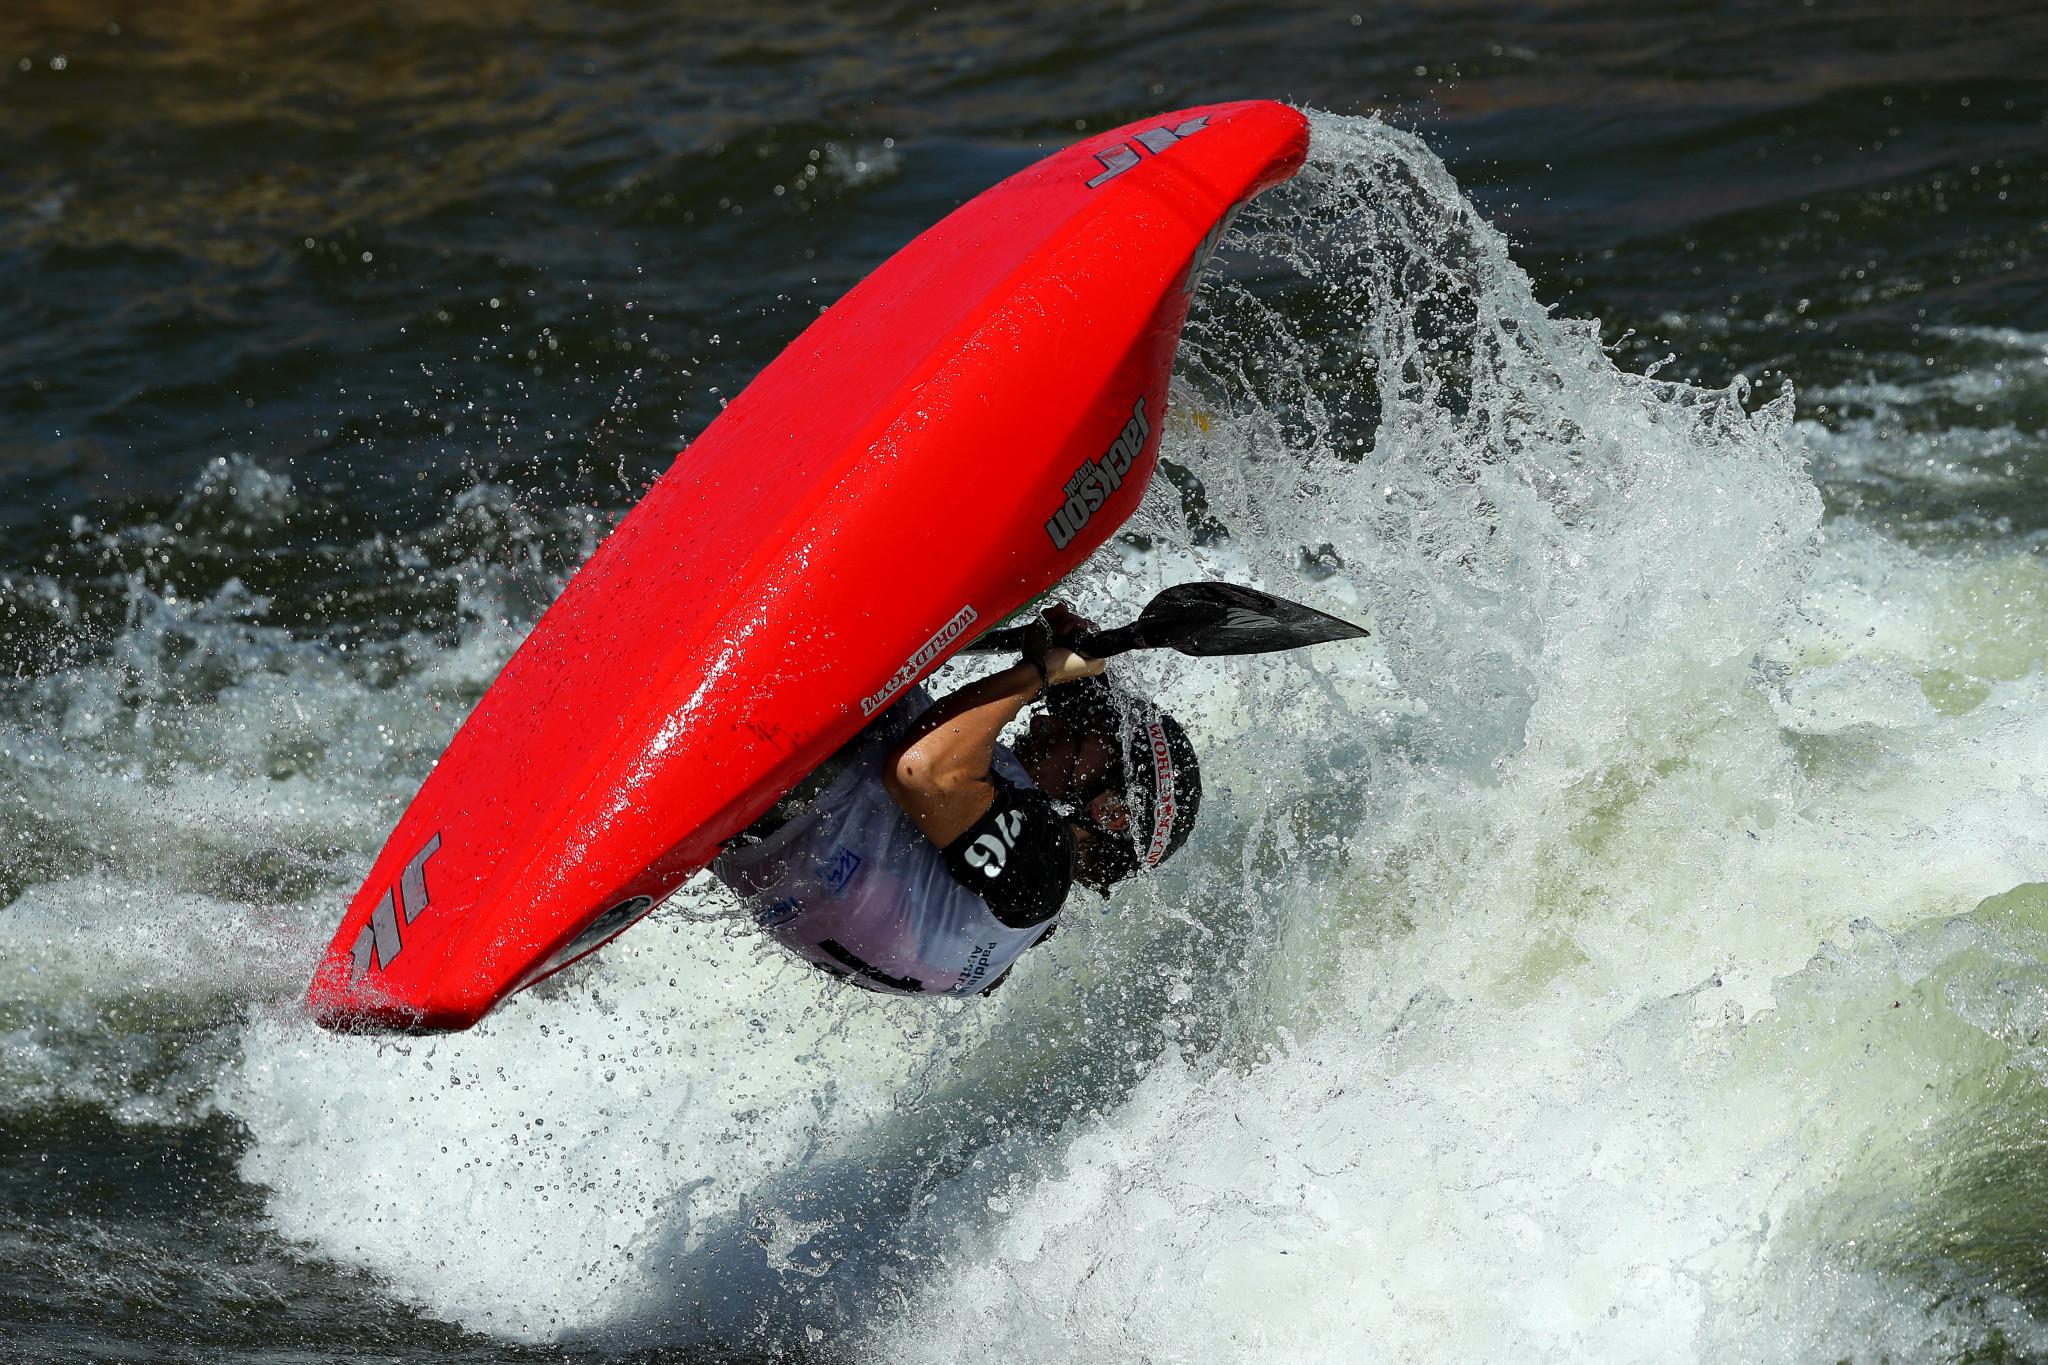 Canoe Freestyle World Championships in Nottingham postponed to 2022